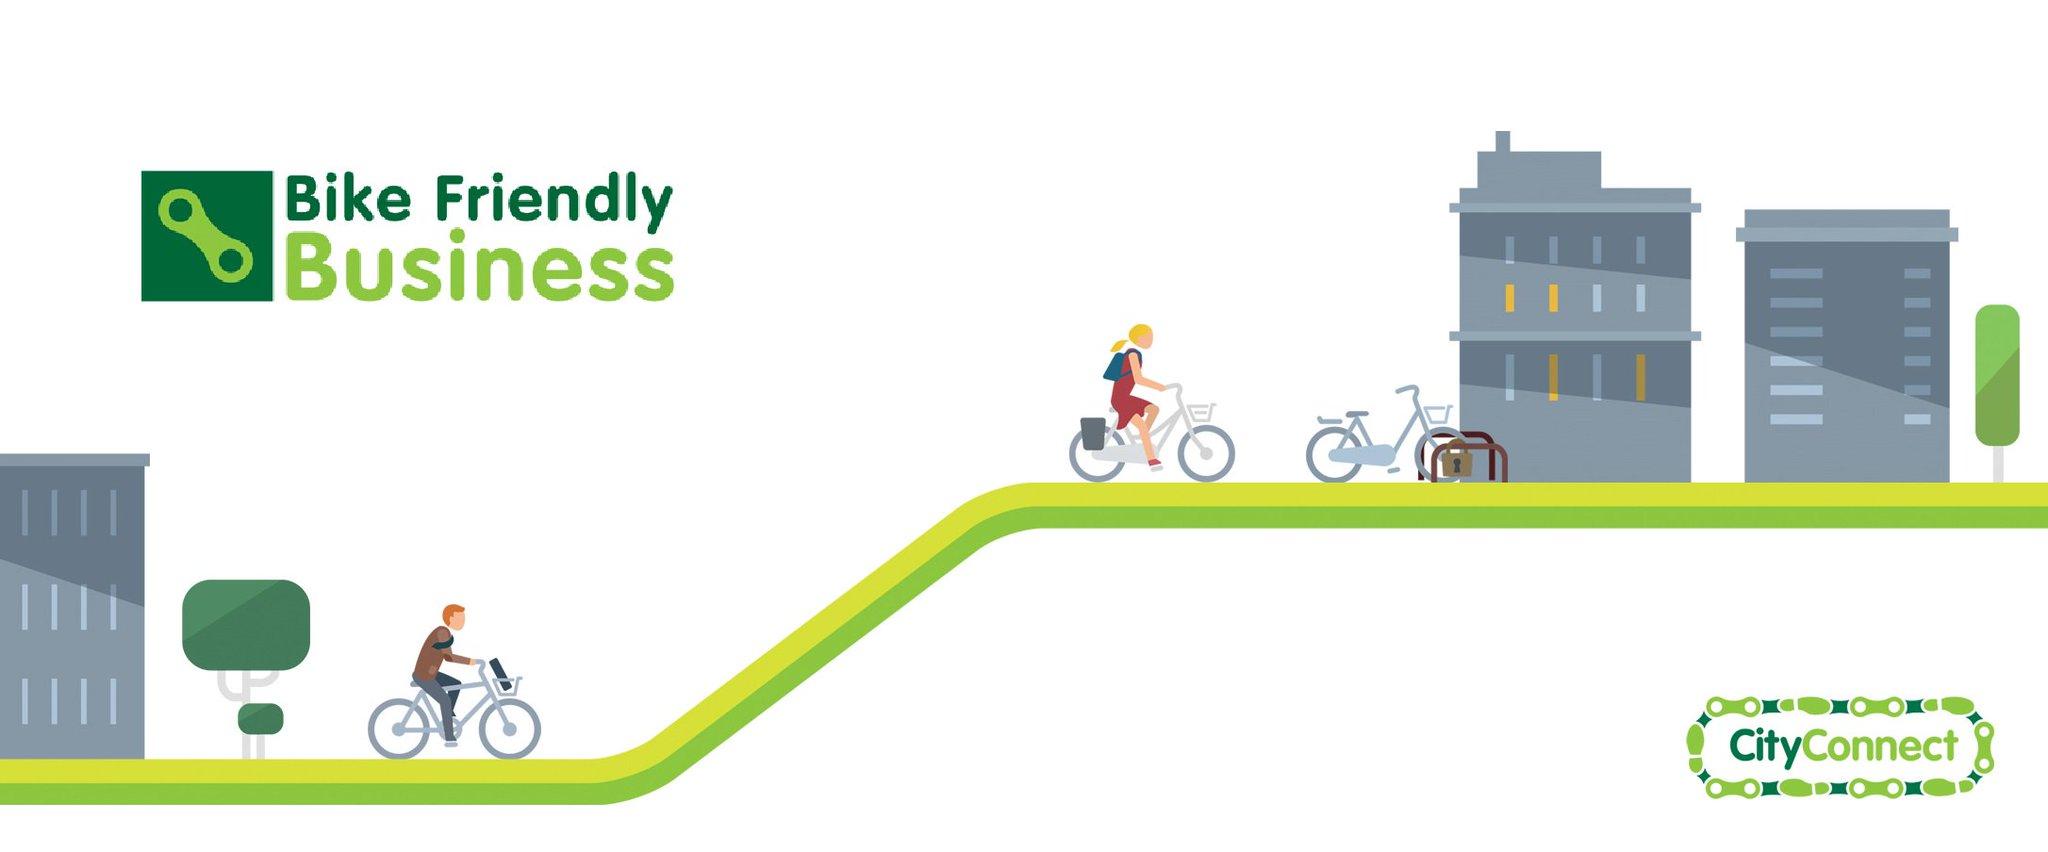 FREE Bike Friendly Business masterclass, 11 May, 10.30am - 12pm in #Bradford. https://t.co/KQAZ0VHpRR  @bradfordmdc #Cycleactivecity https://t.co/Q3SttnwKFg